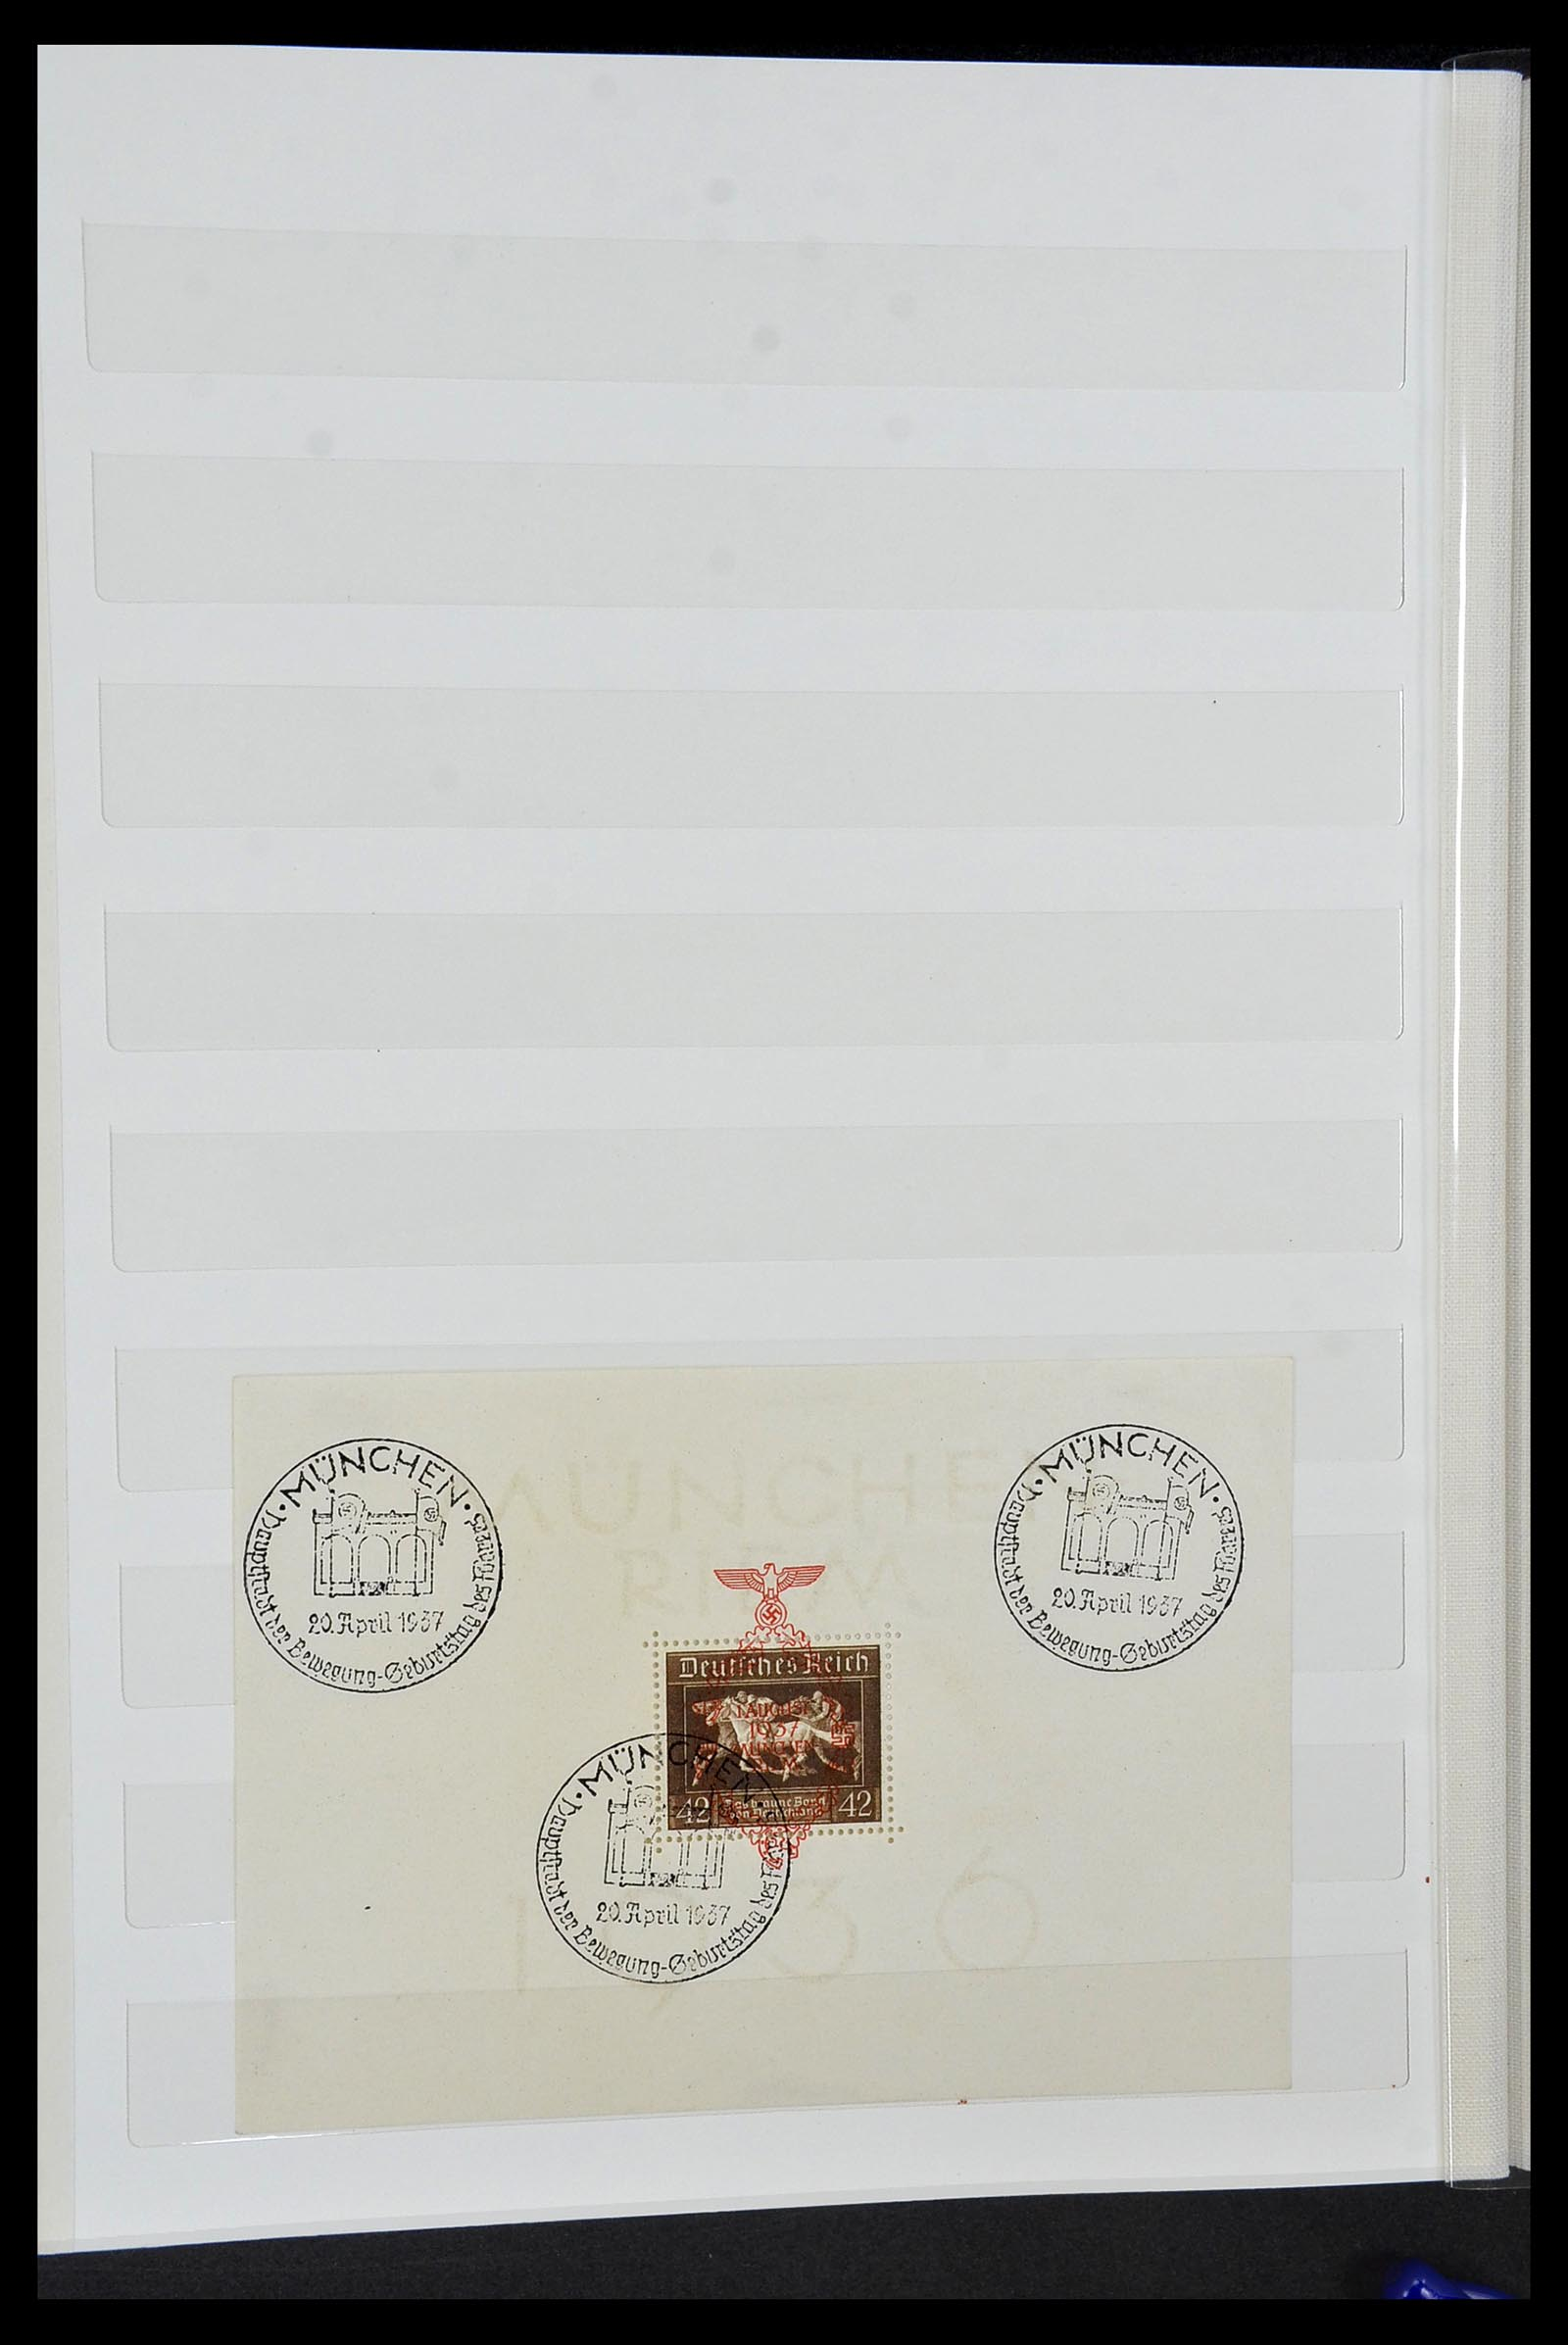 34069 017 - Postzegelverzameling 34069 Duitsland 1855-1952.